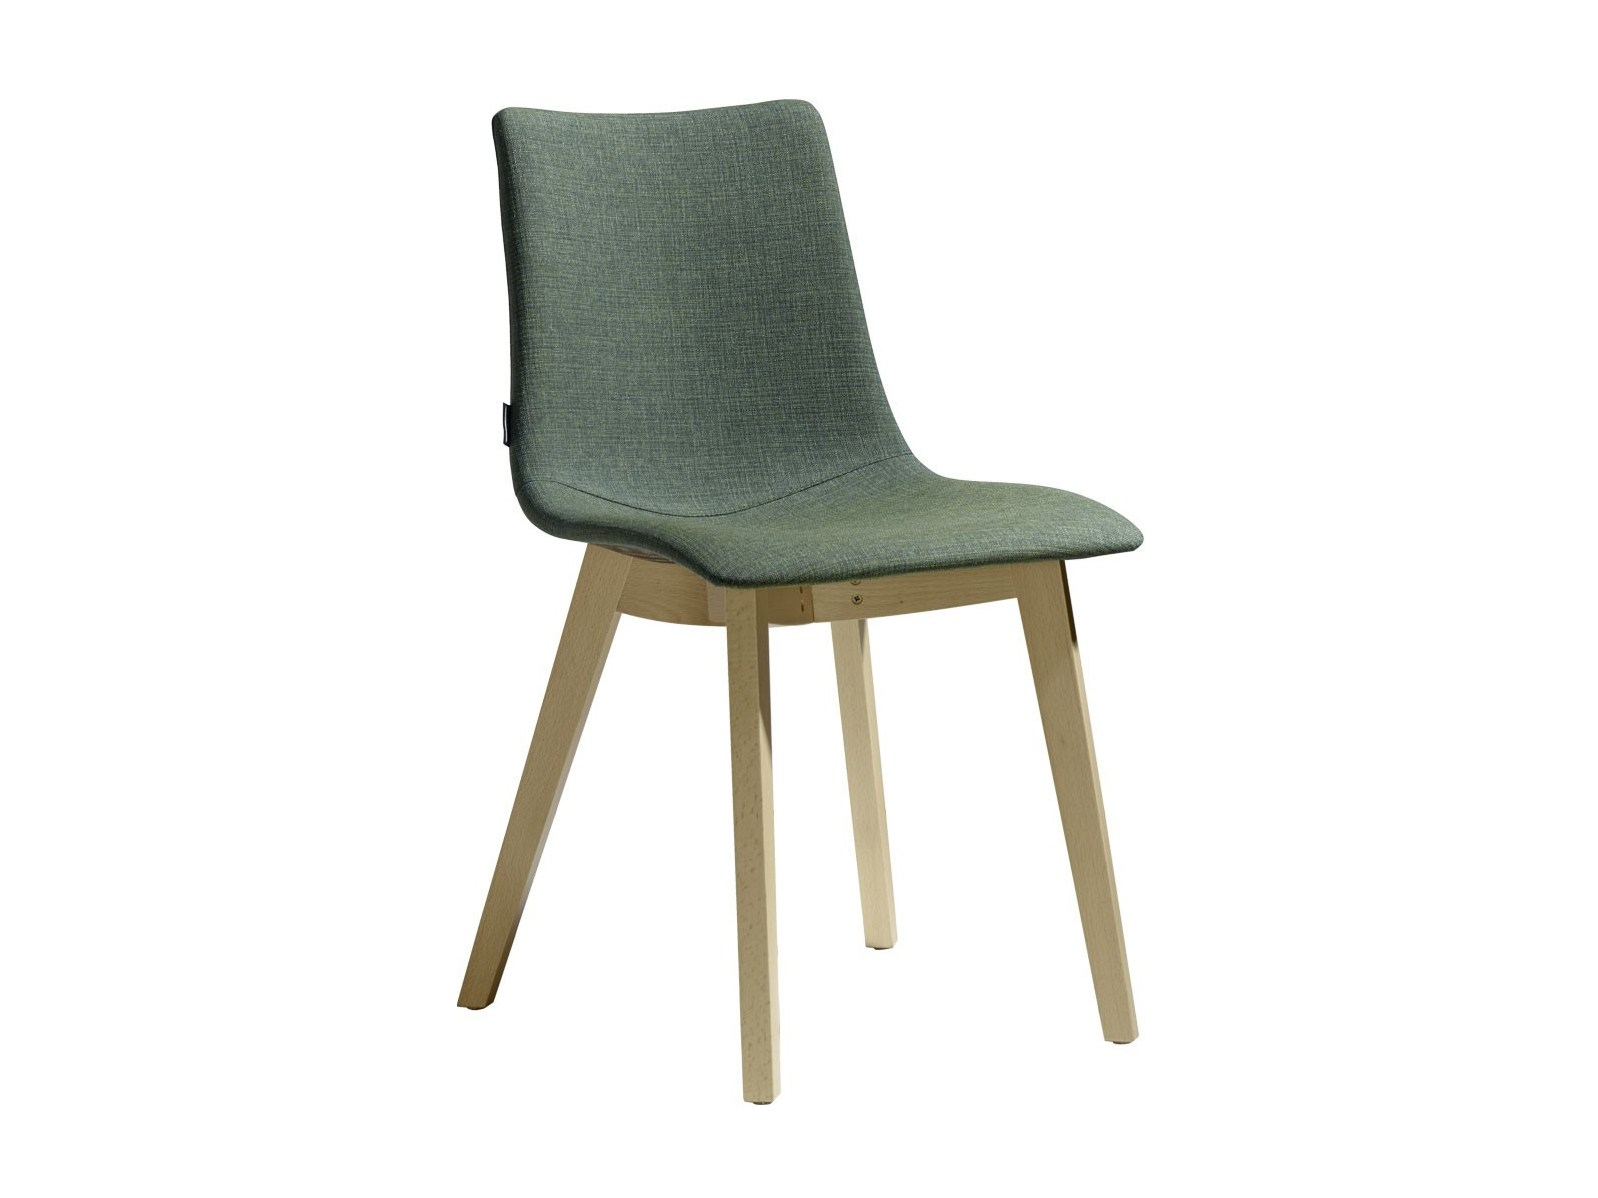 natural zebra pop chaise rembourr e by scab design. Black Bedroom Furniture Sets. Home Design Ideas